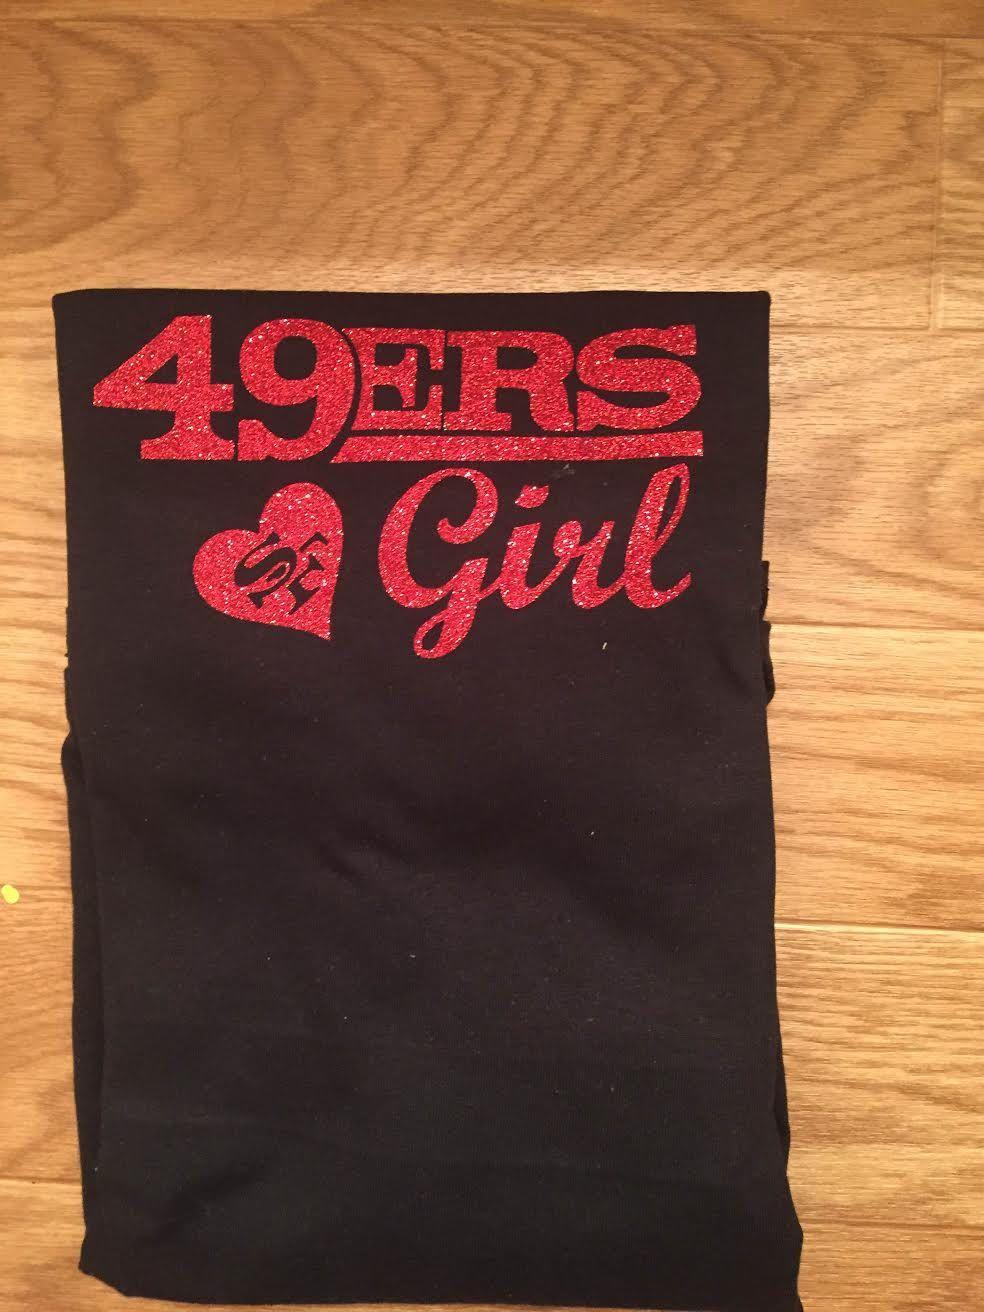 San Francisco Edition New 49ers Niner Empire Long Sleeve T-Shirt Red /& Black